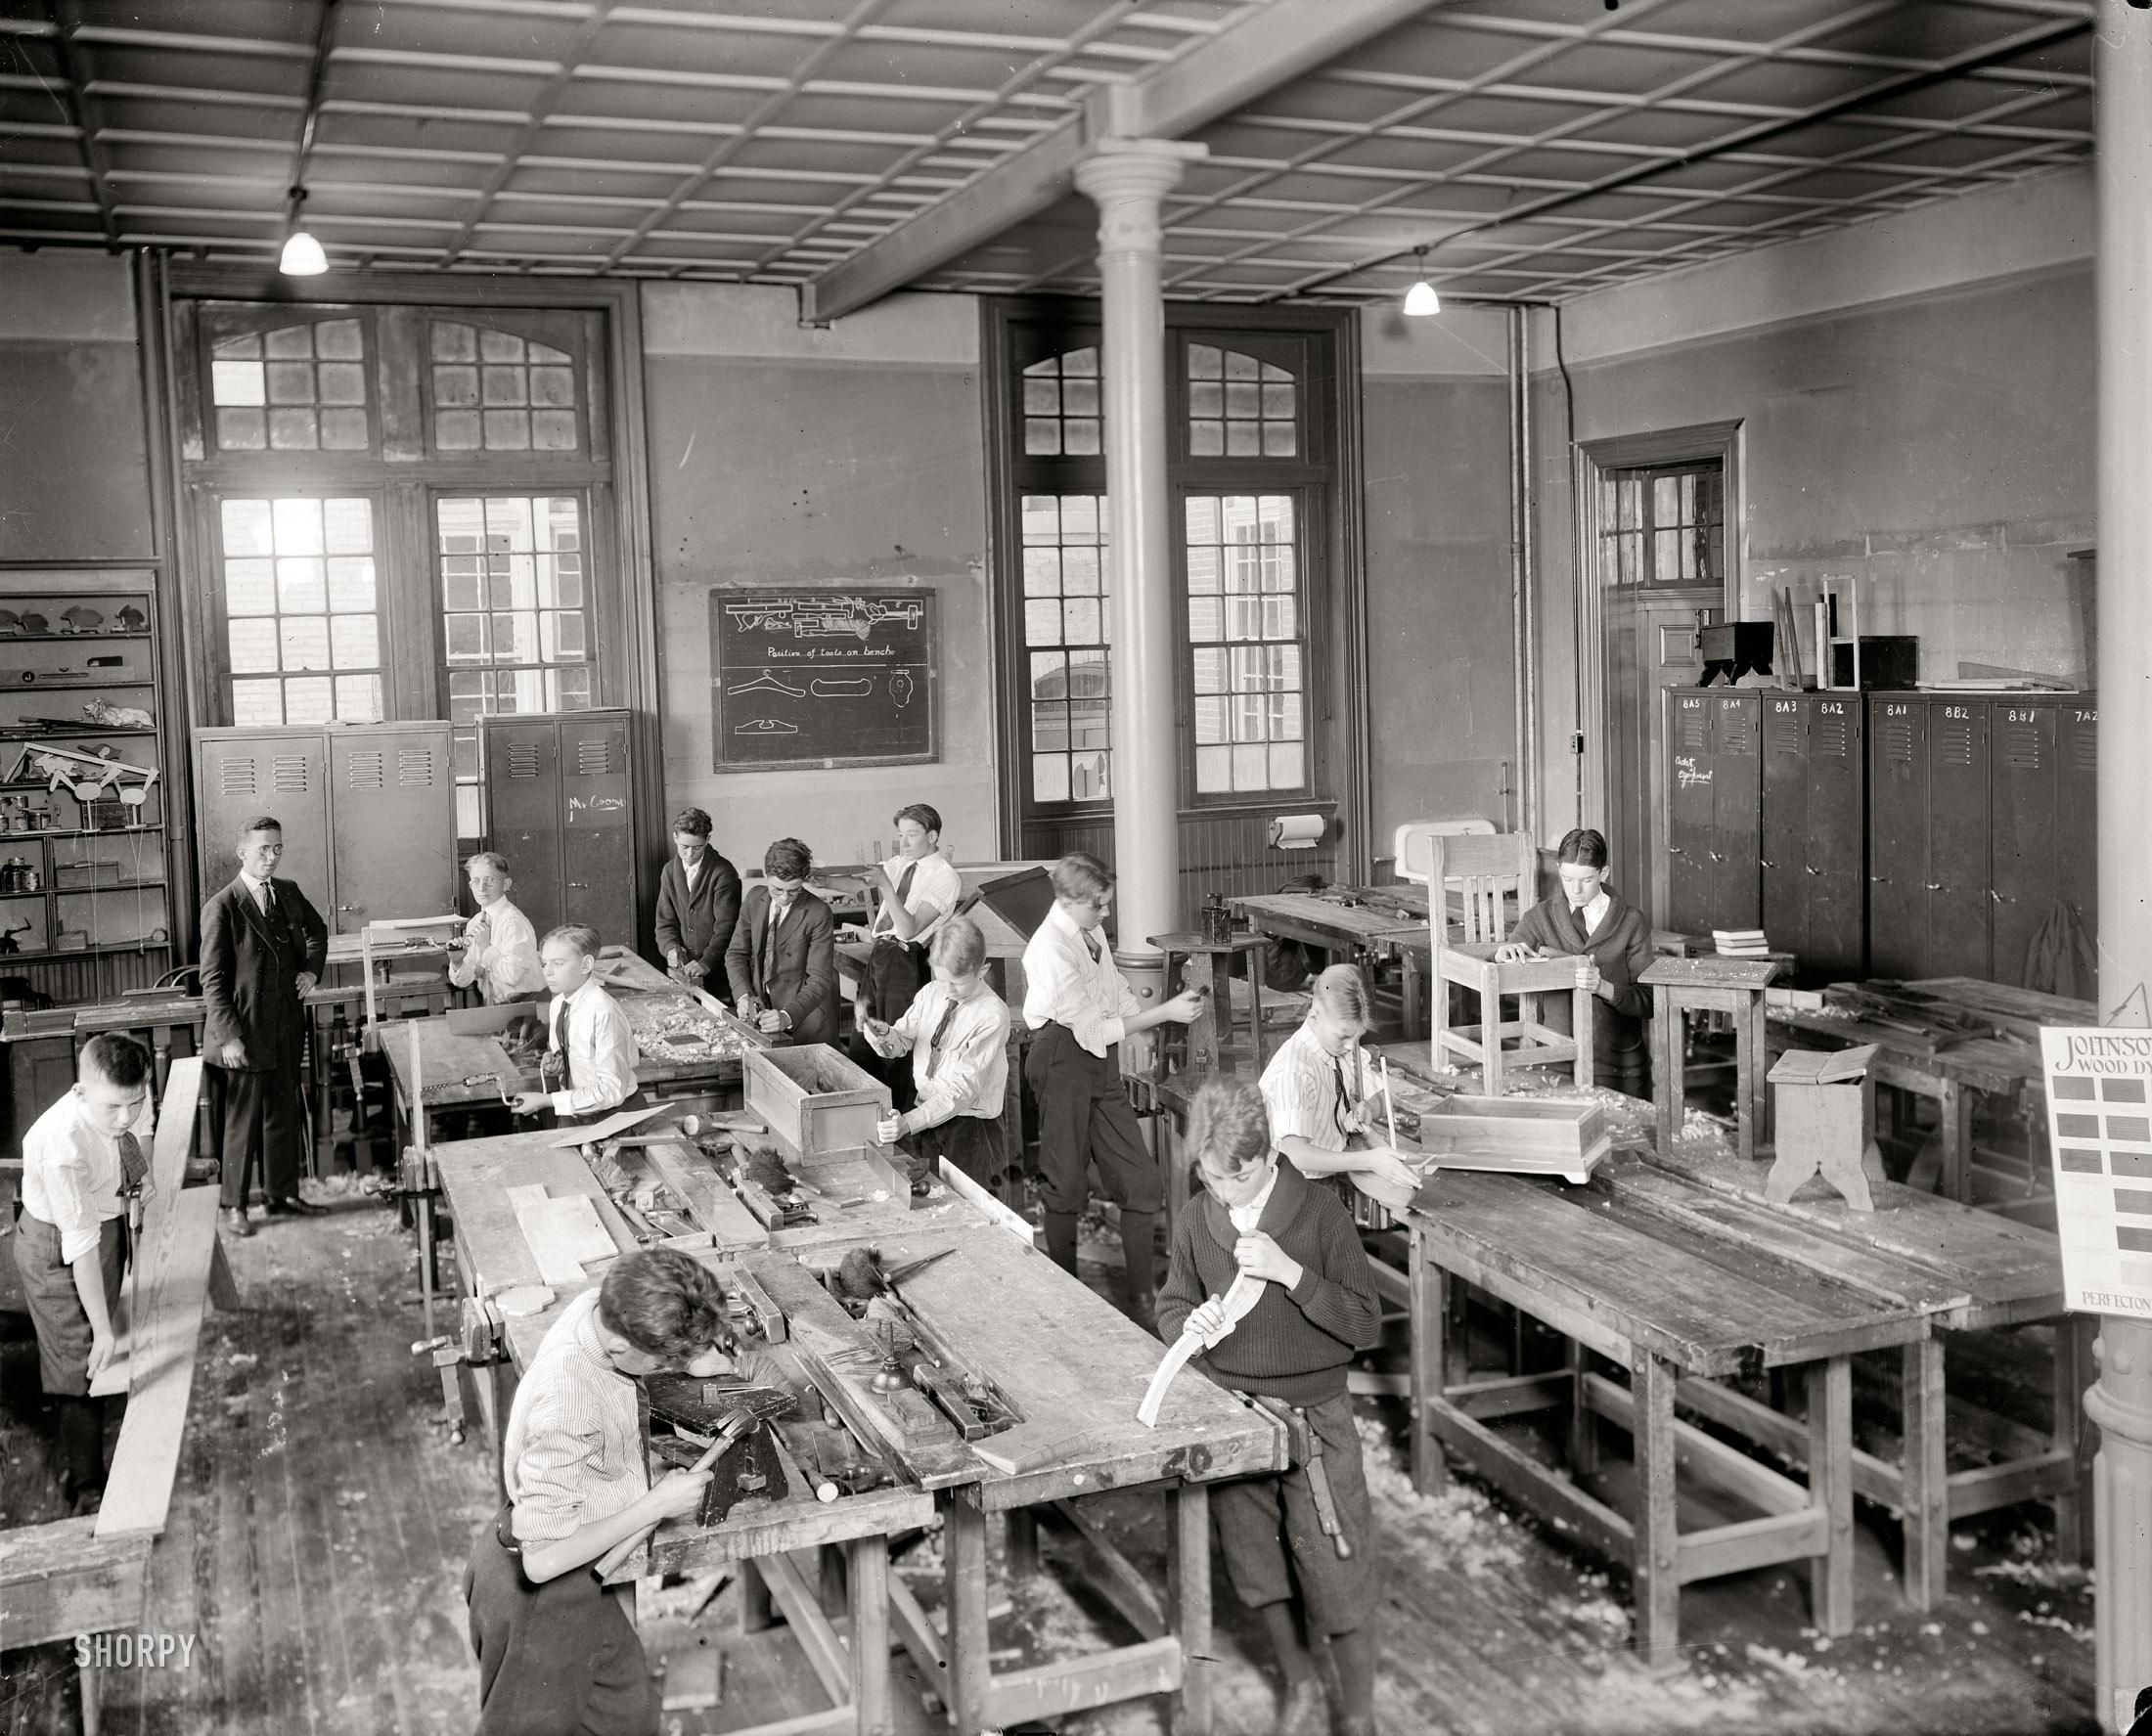 картинки фото школы прошлого что снимки